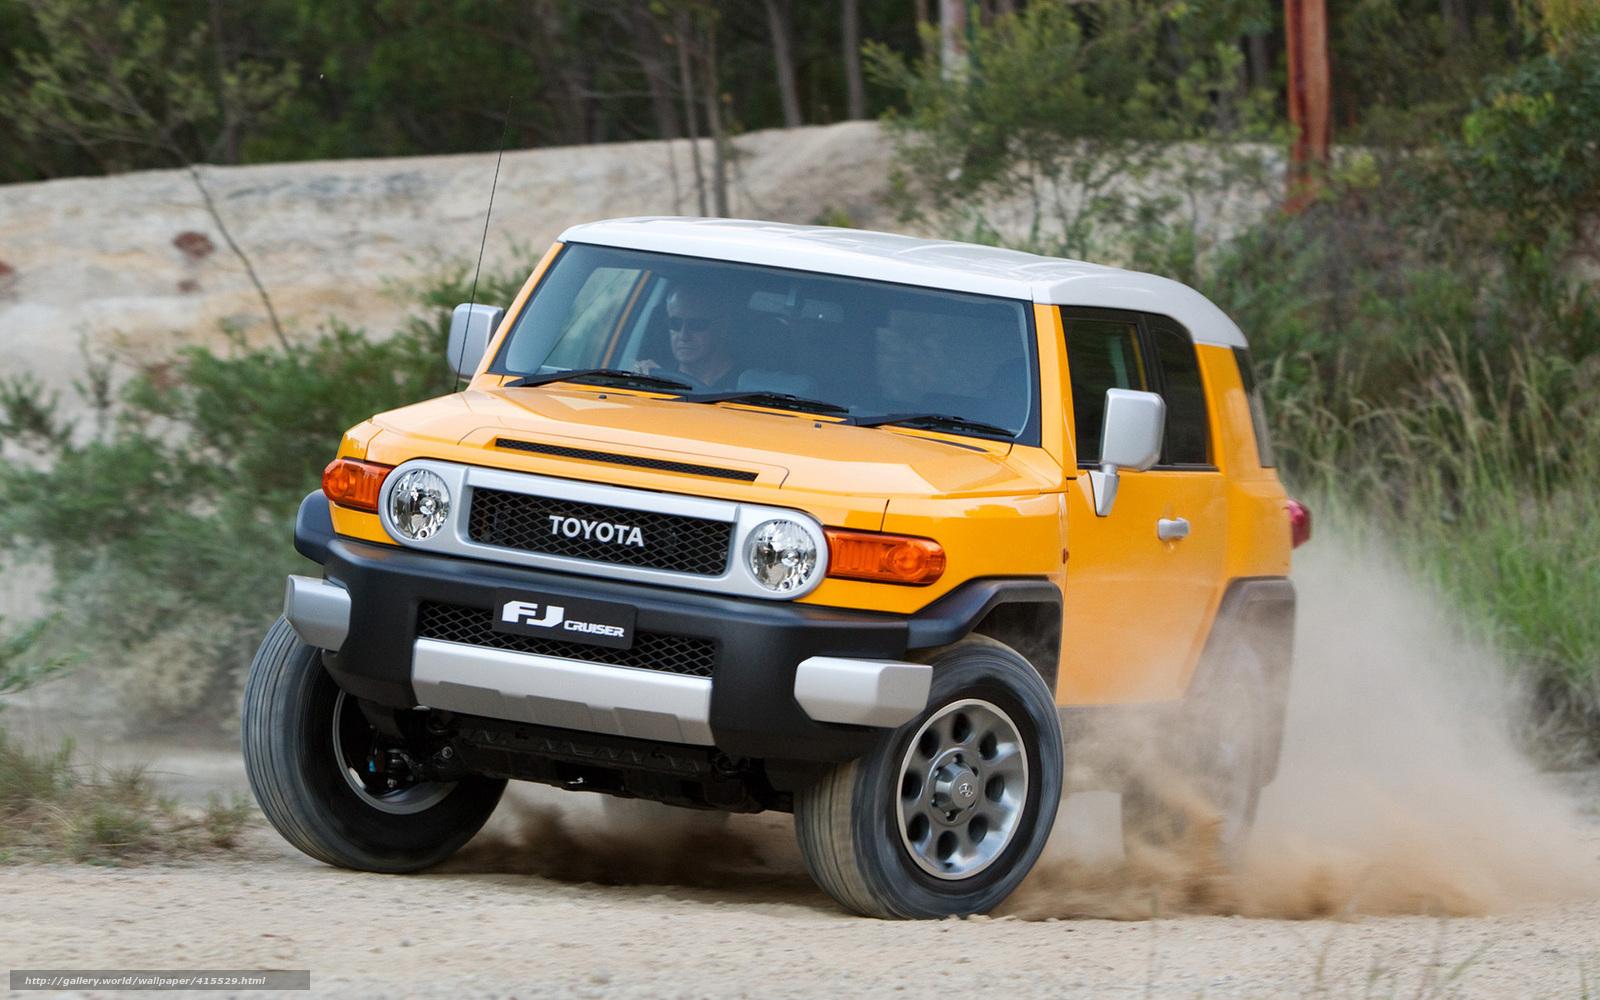 Download Wallpaper Toyota Efdzhey Cruiser Jeep Free